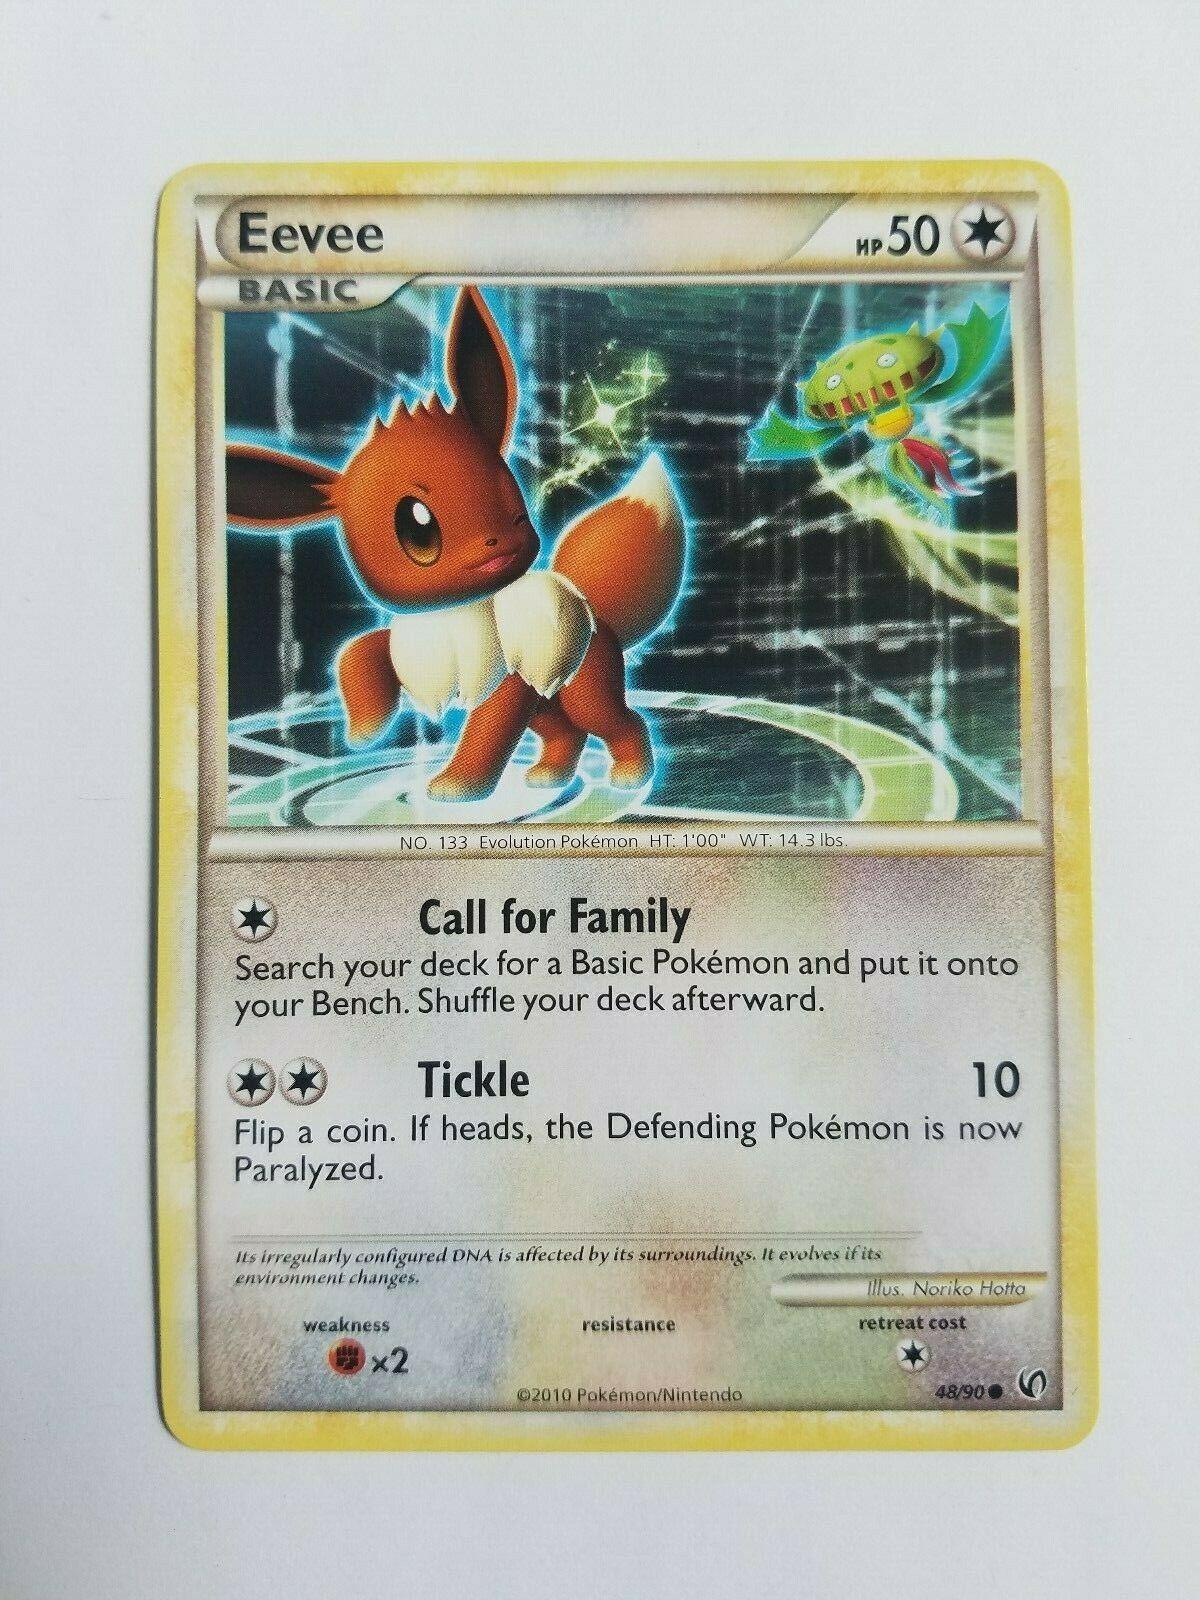 Eevee Friends Evolution card Deck Shields Pokemon center JAPAN 64 Sleeves